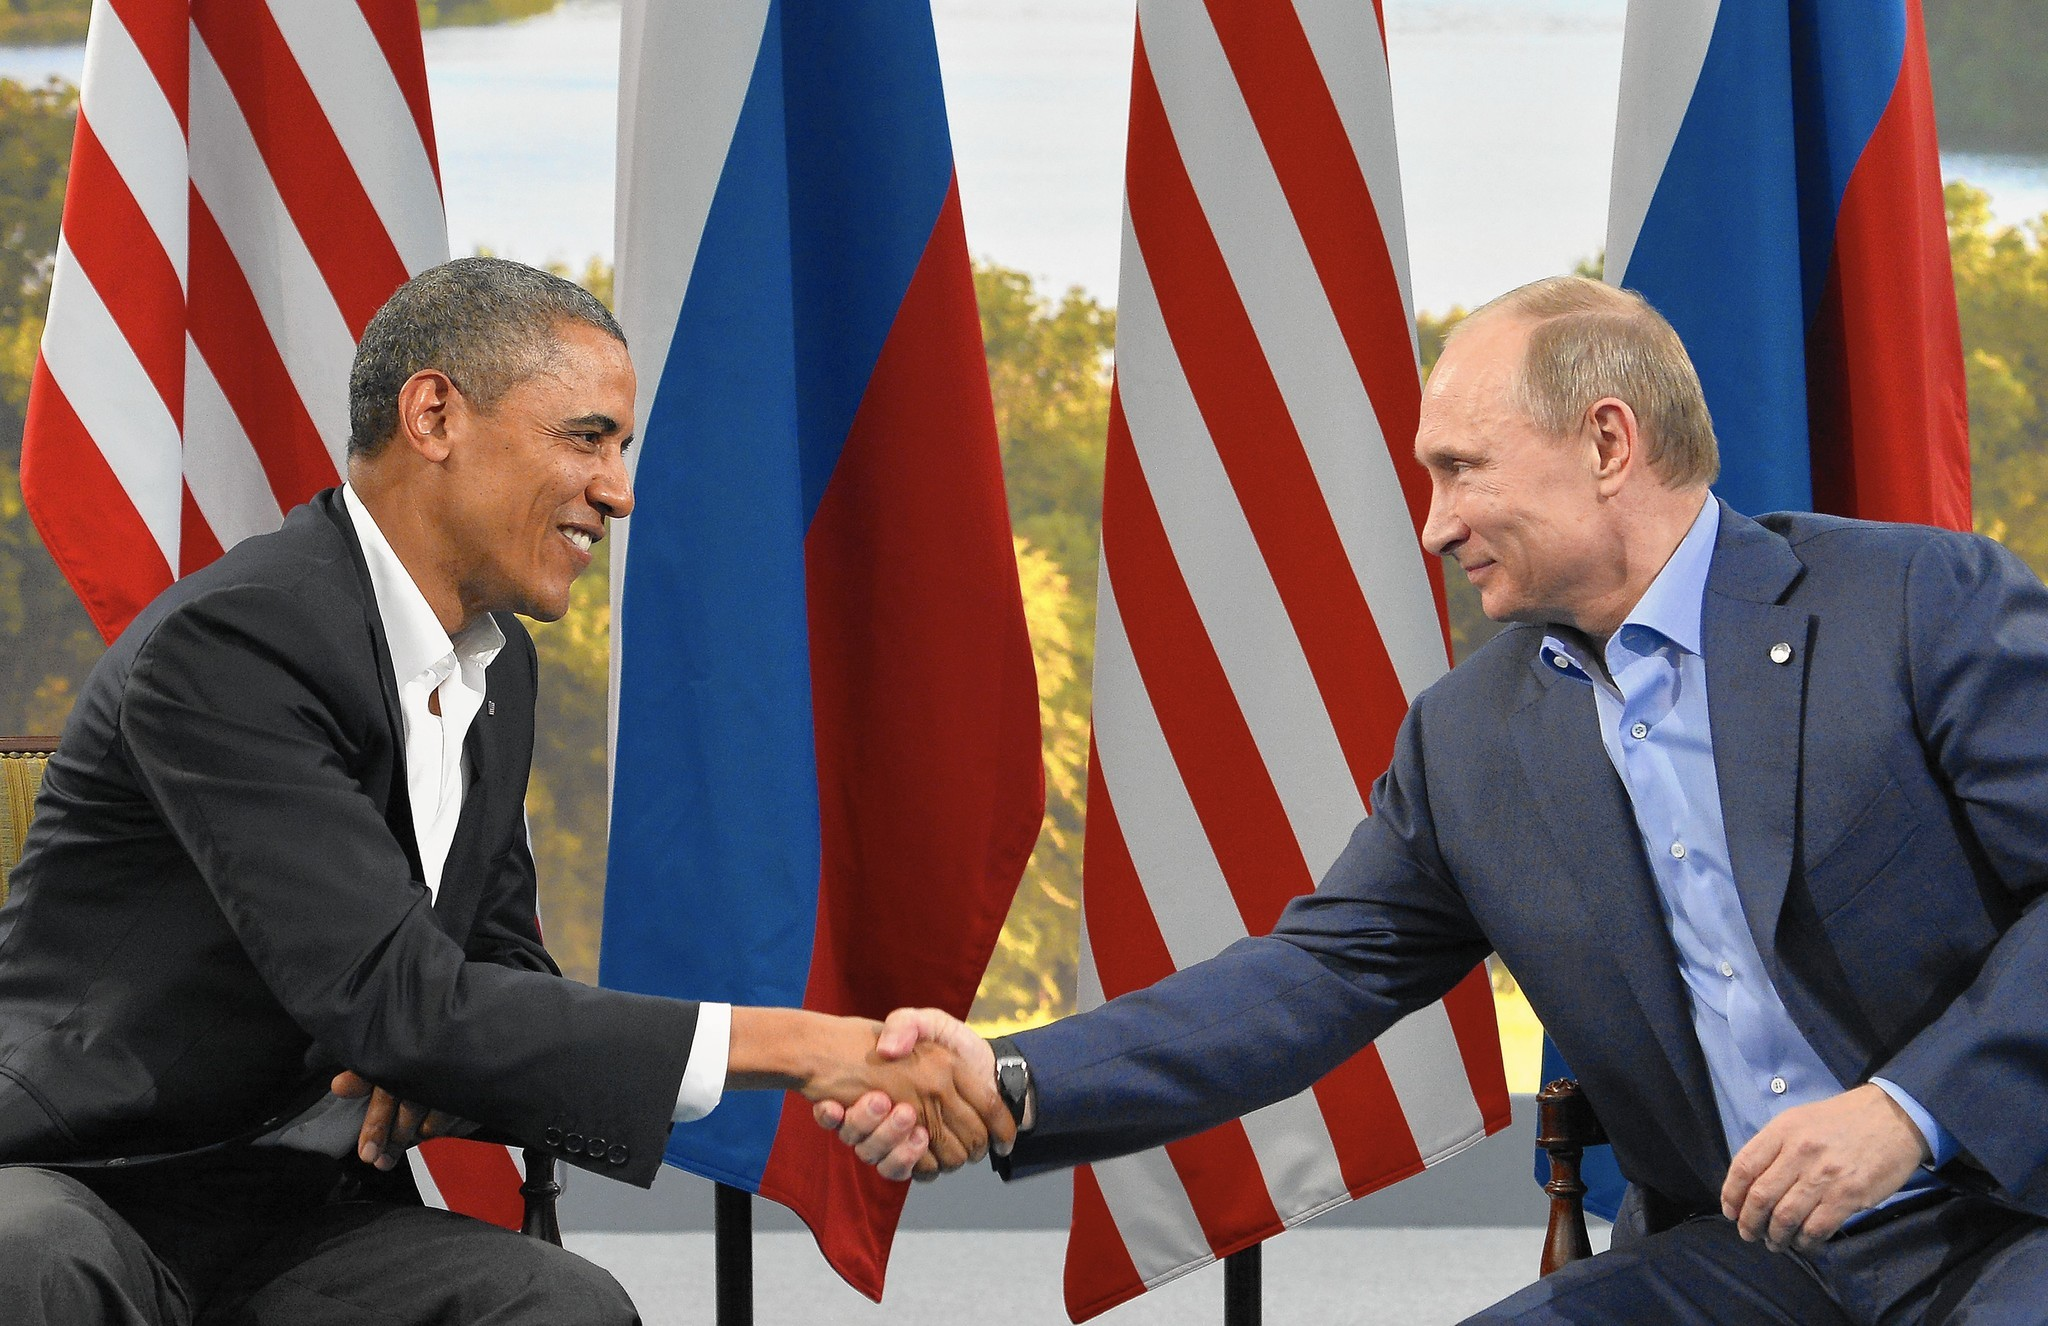 vladimir putin and obama relationship